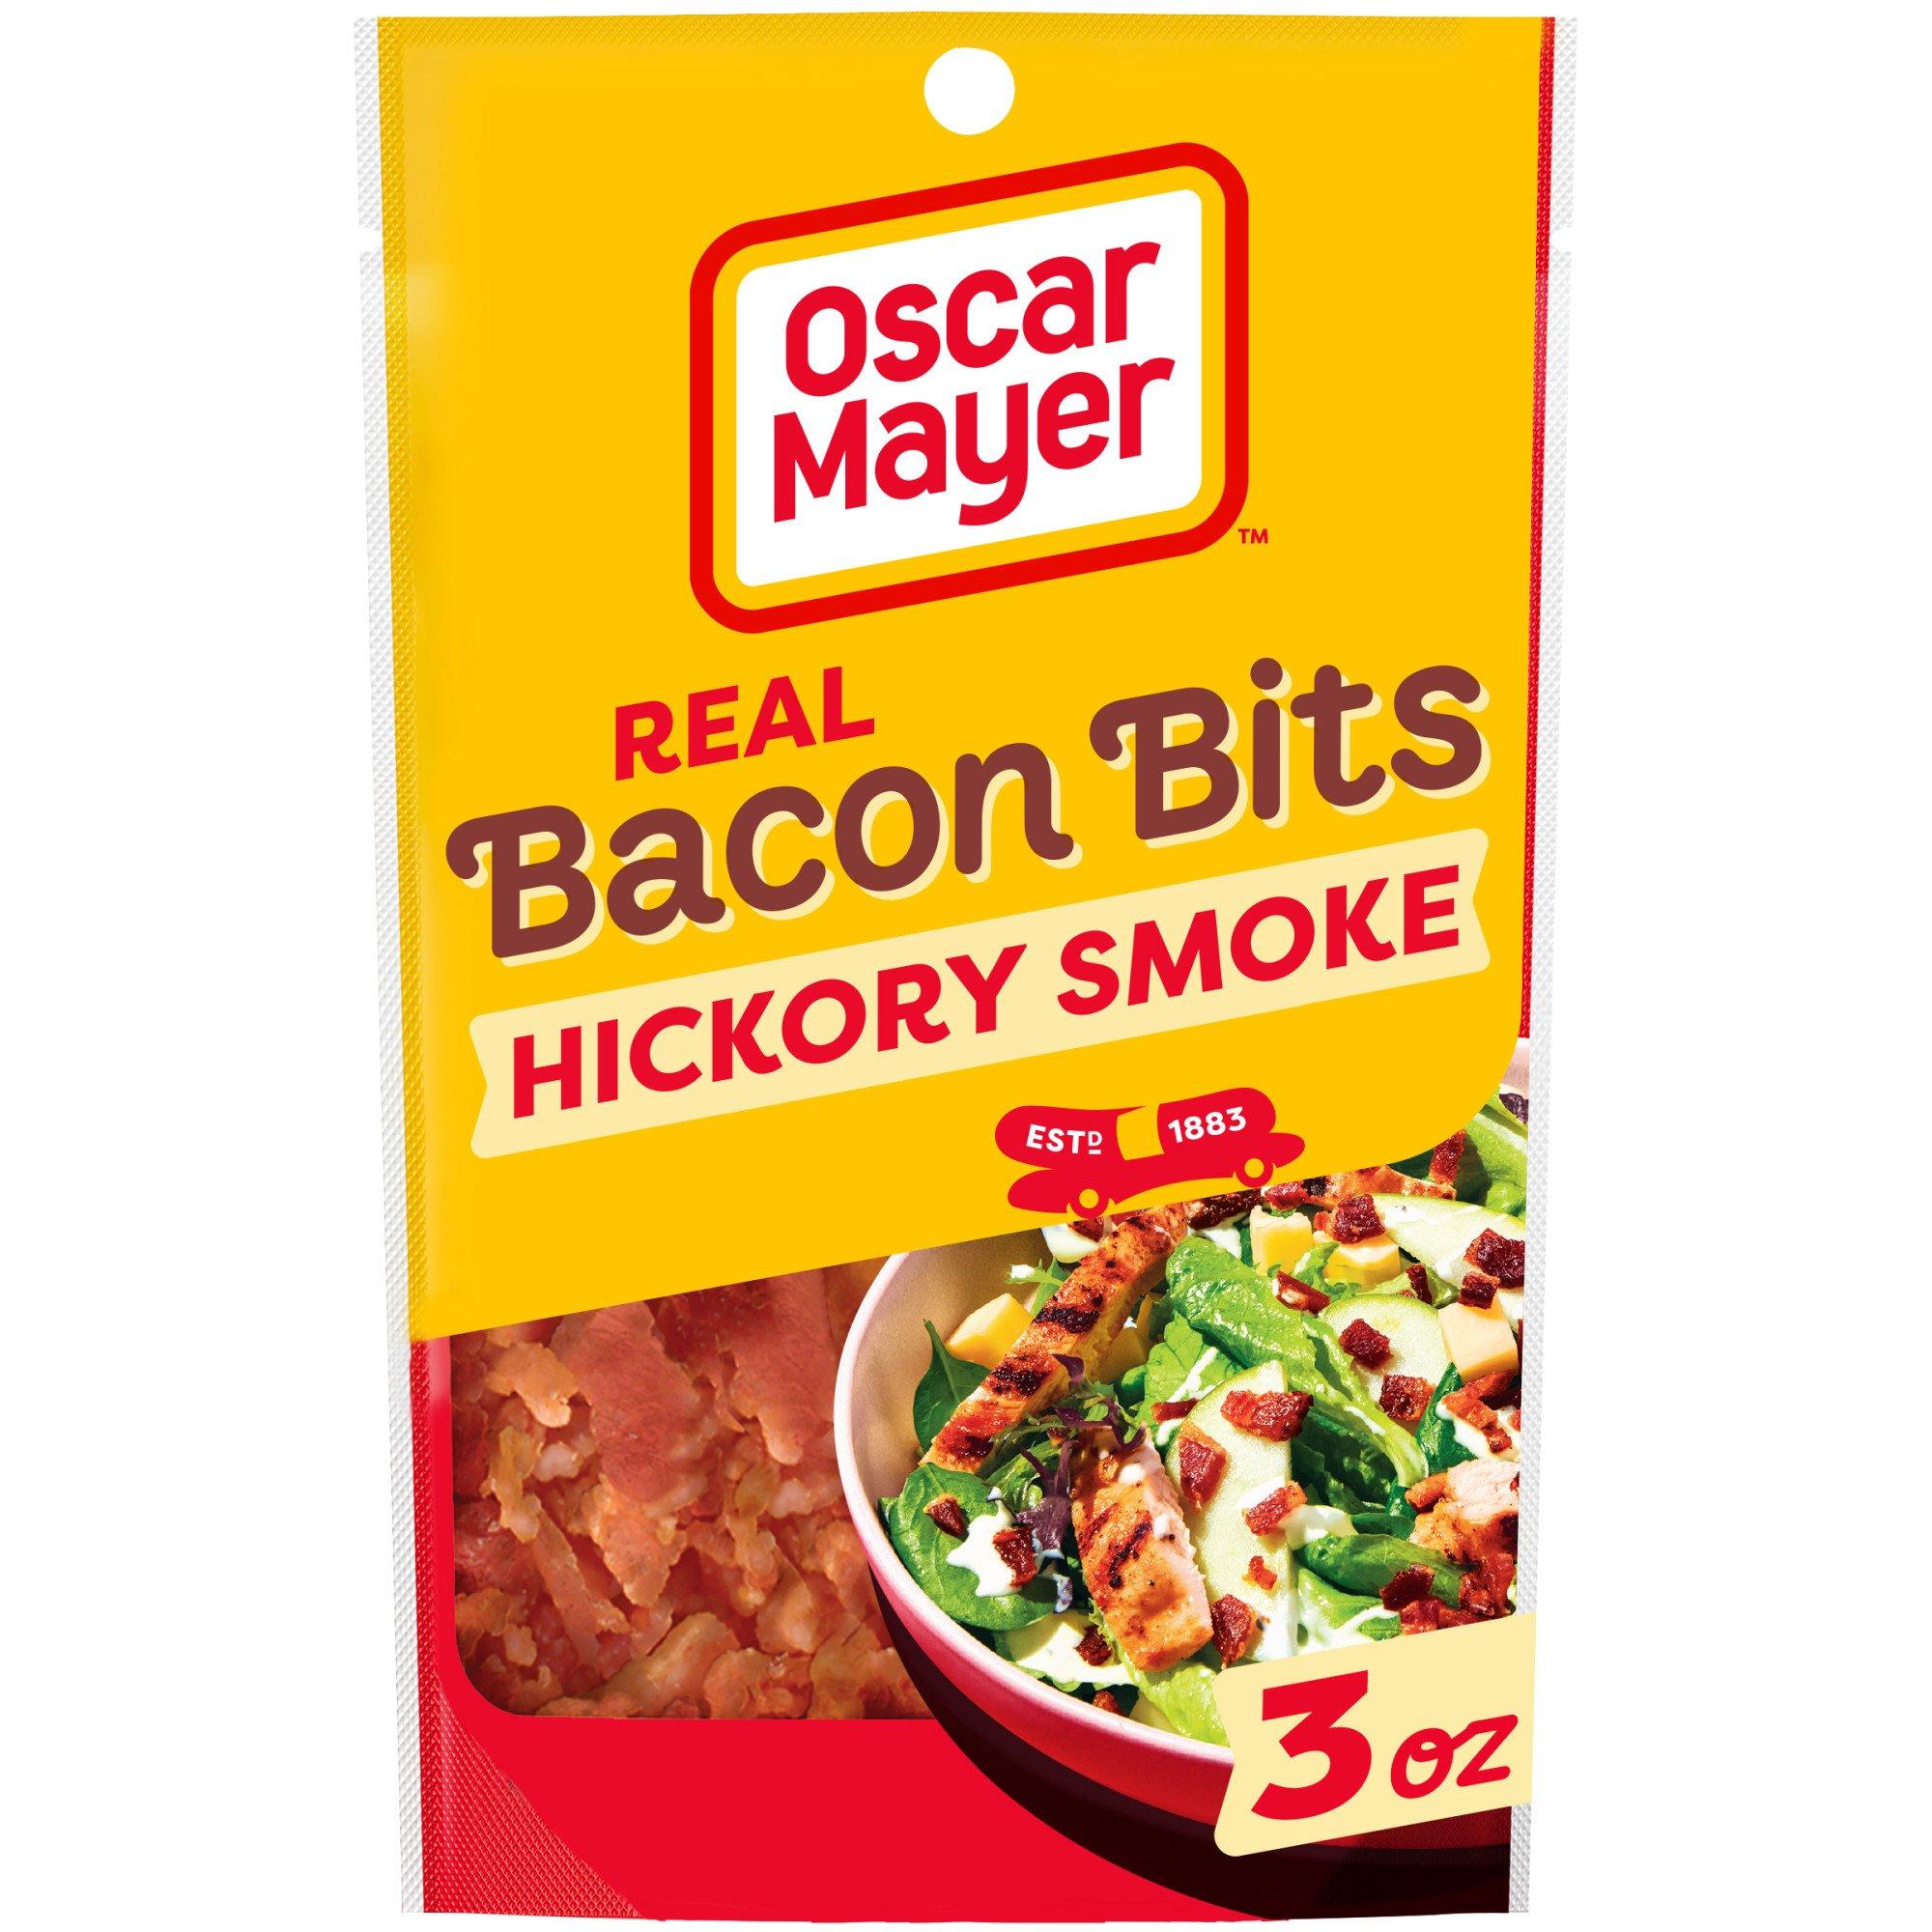 Oscar Mayer Real Bacon Bits - Shop